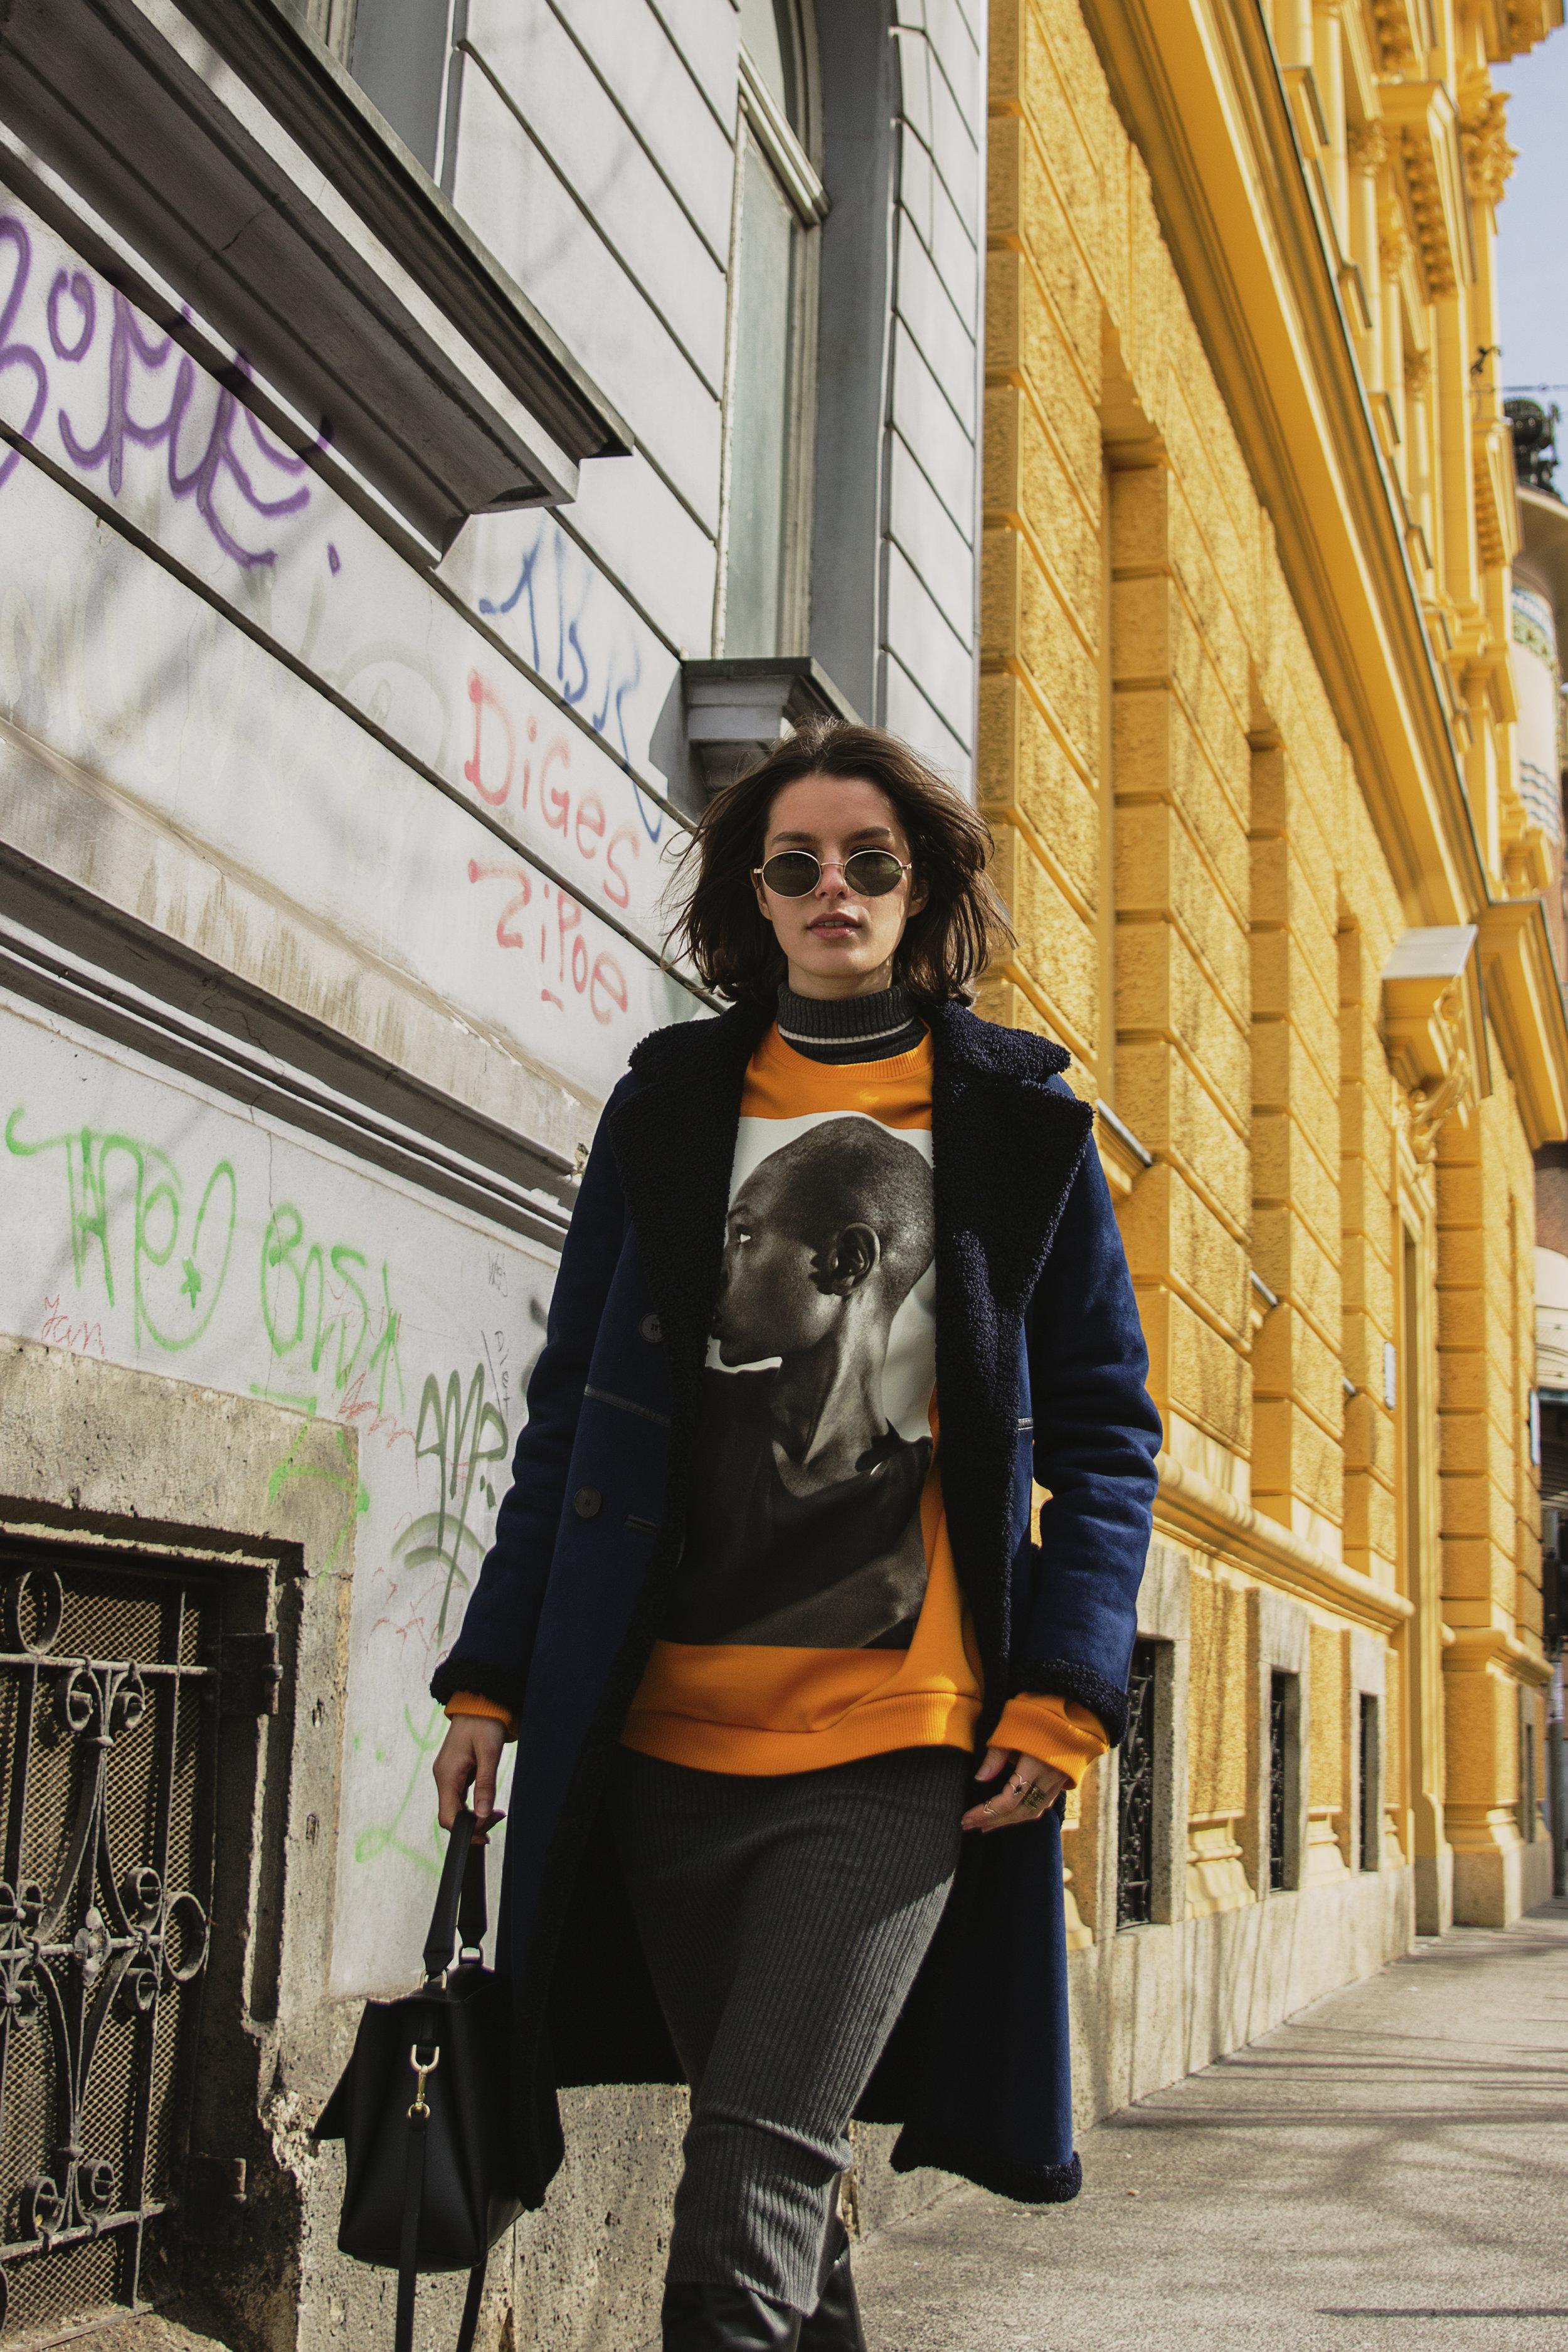 luka-lajic-fashion-photography-zagreb-croatia (2).jpg